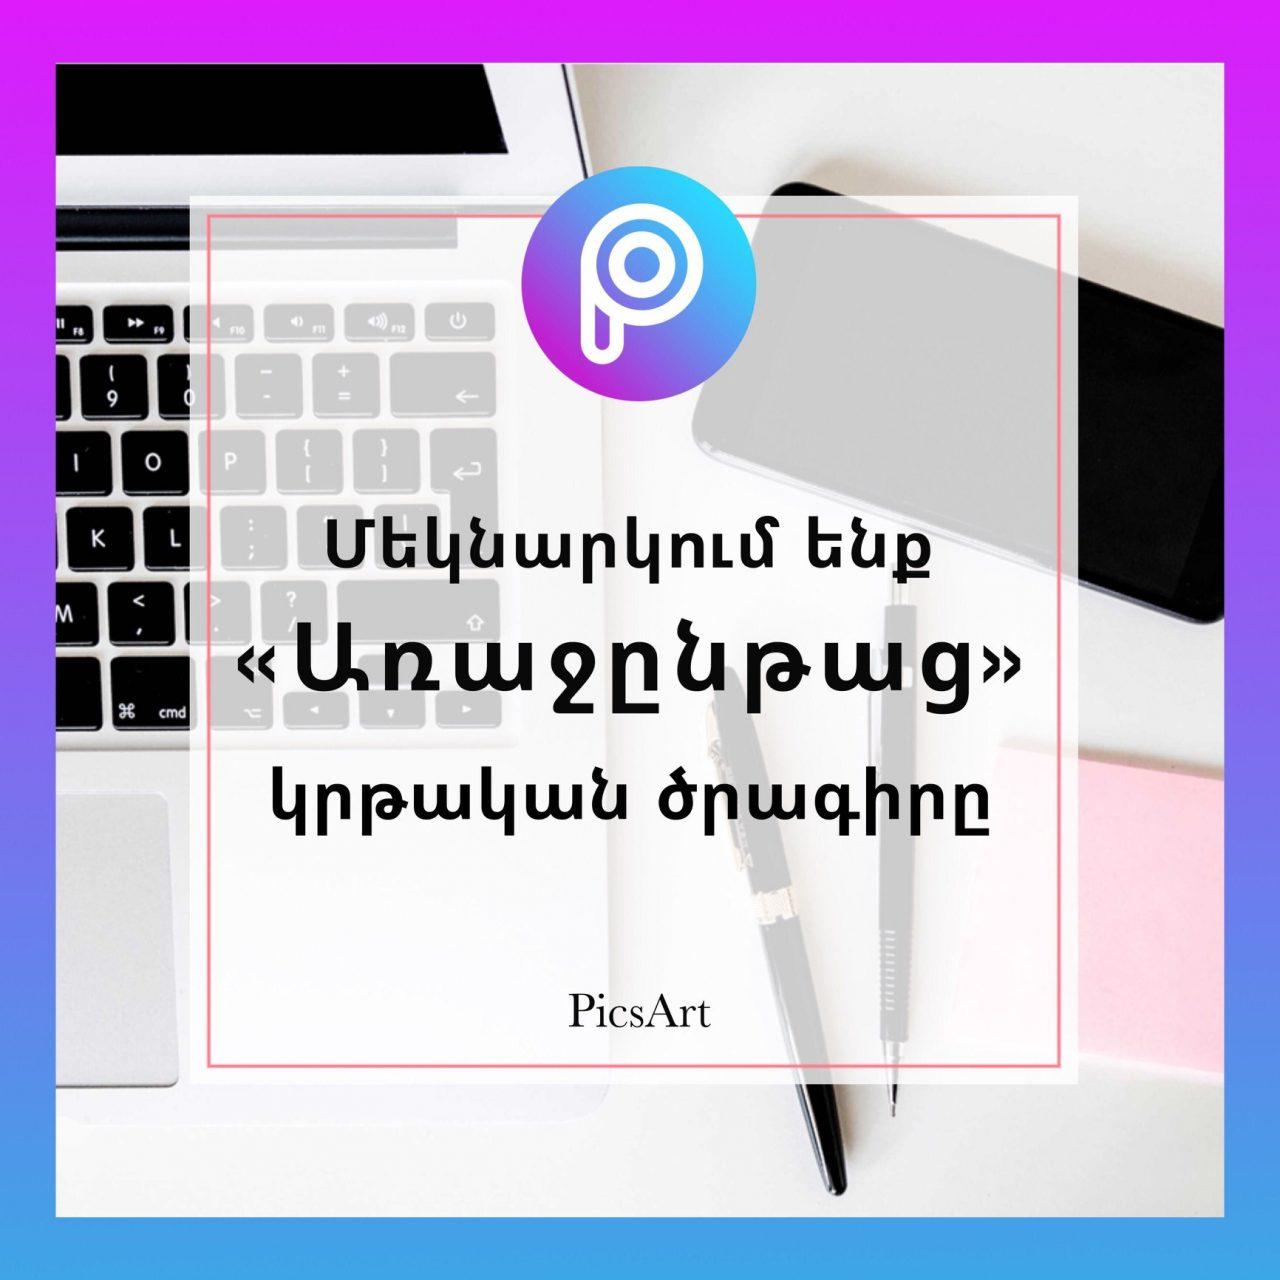 PicsArt-ը մեկնարկում է «Առաջընթաց» կրթական ծրագիրը